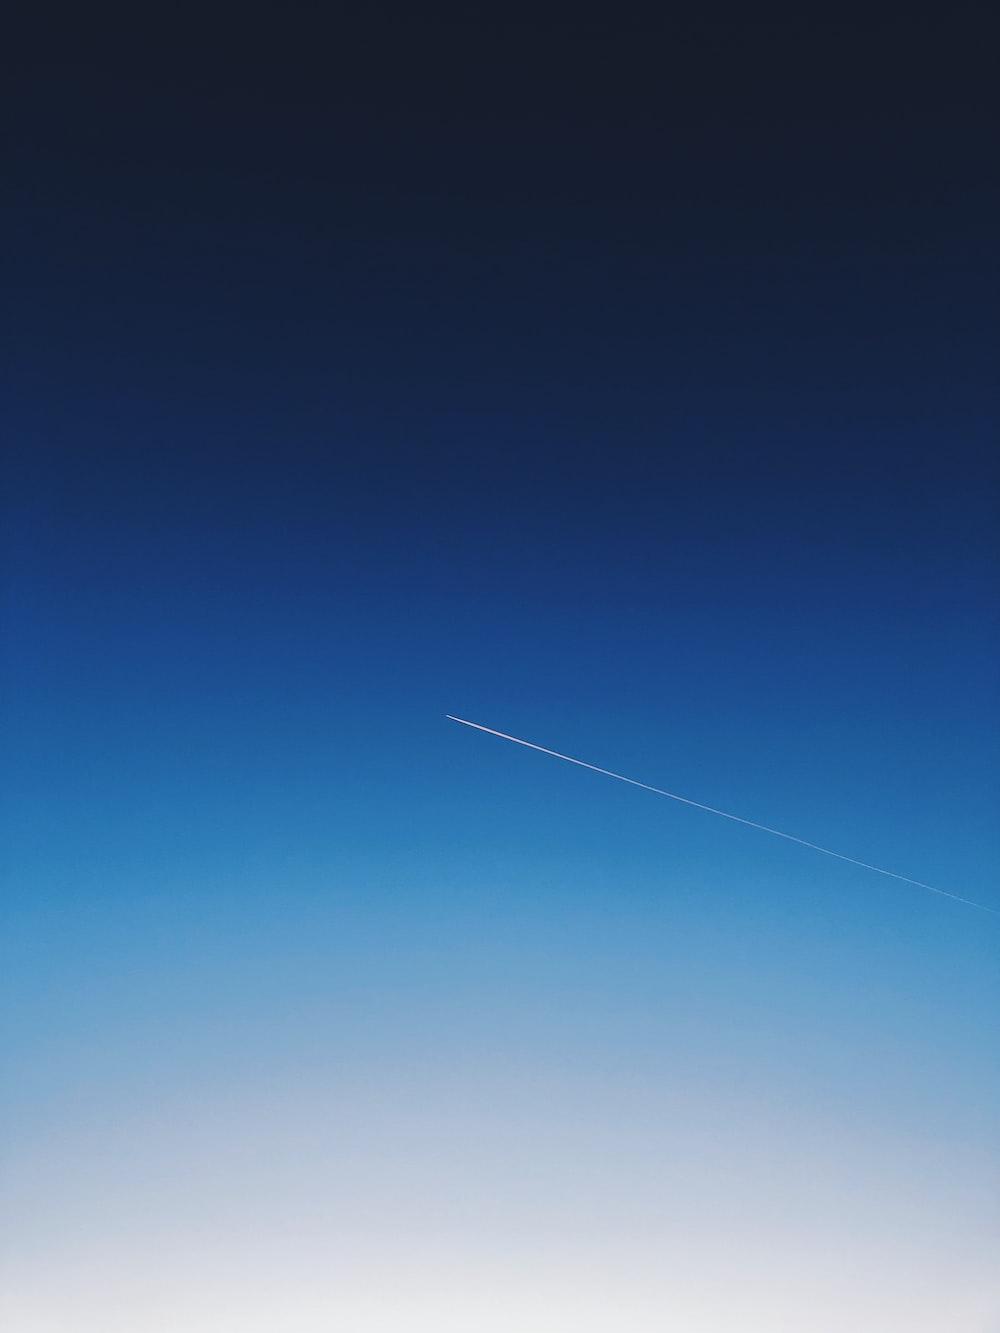 white smoke trail in the sky